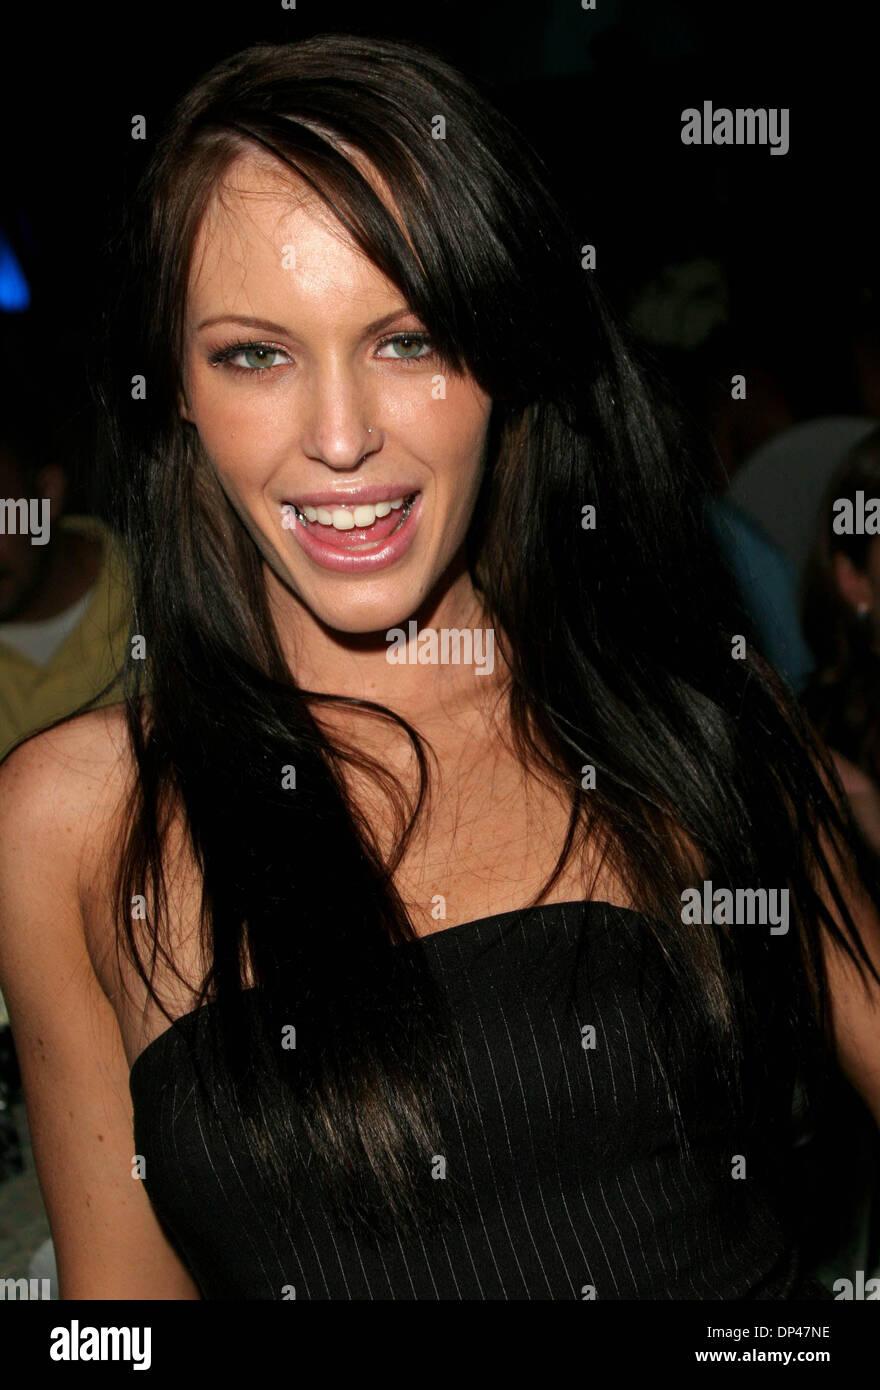 Jenna Presley photos 5